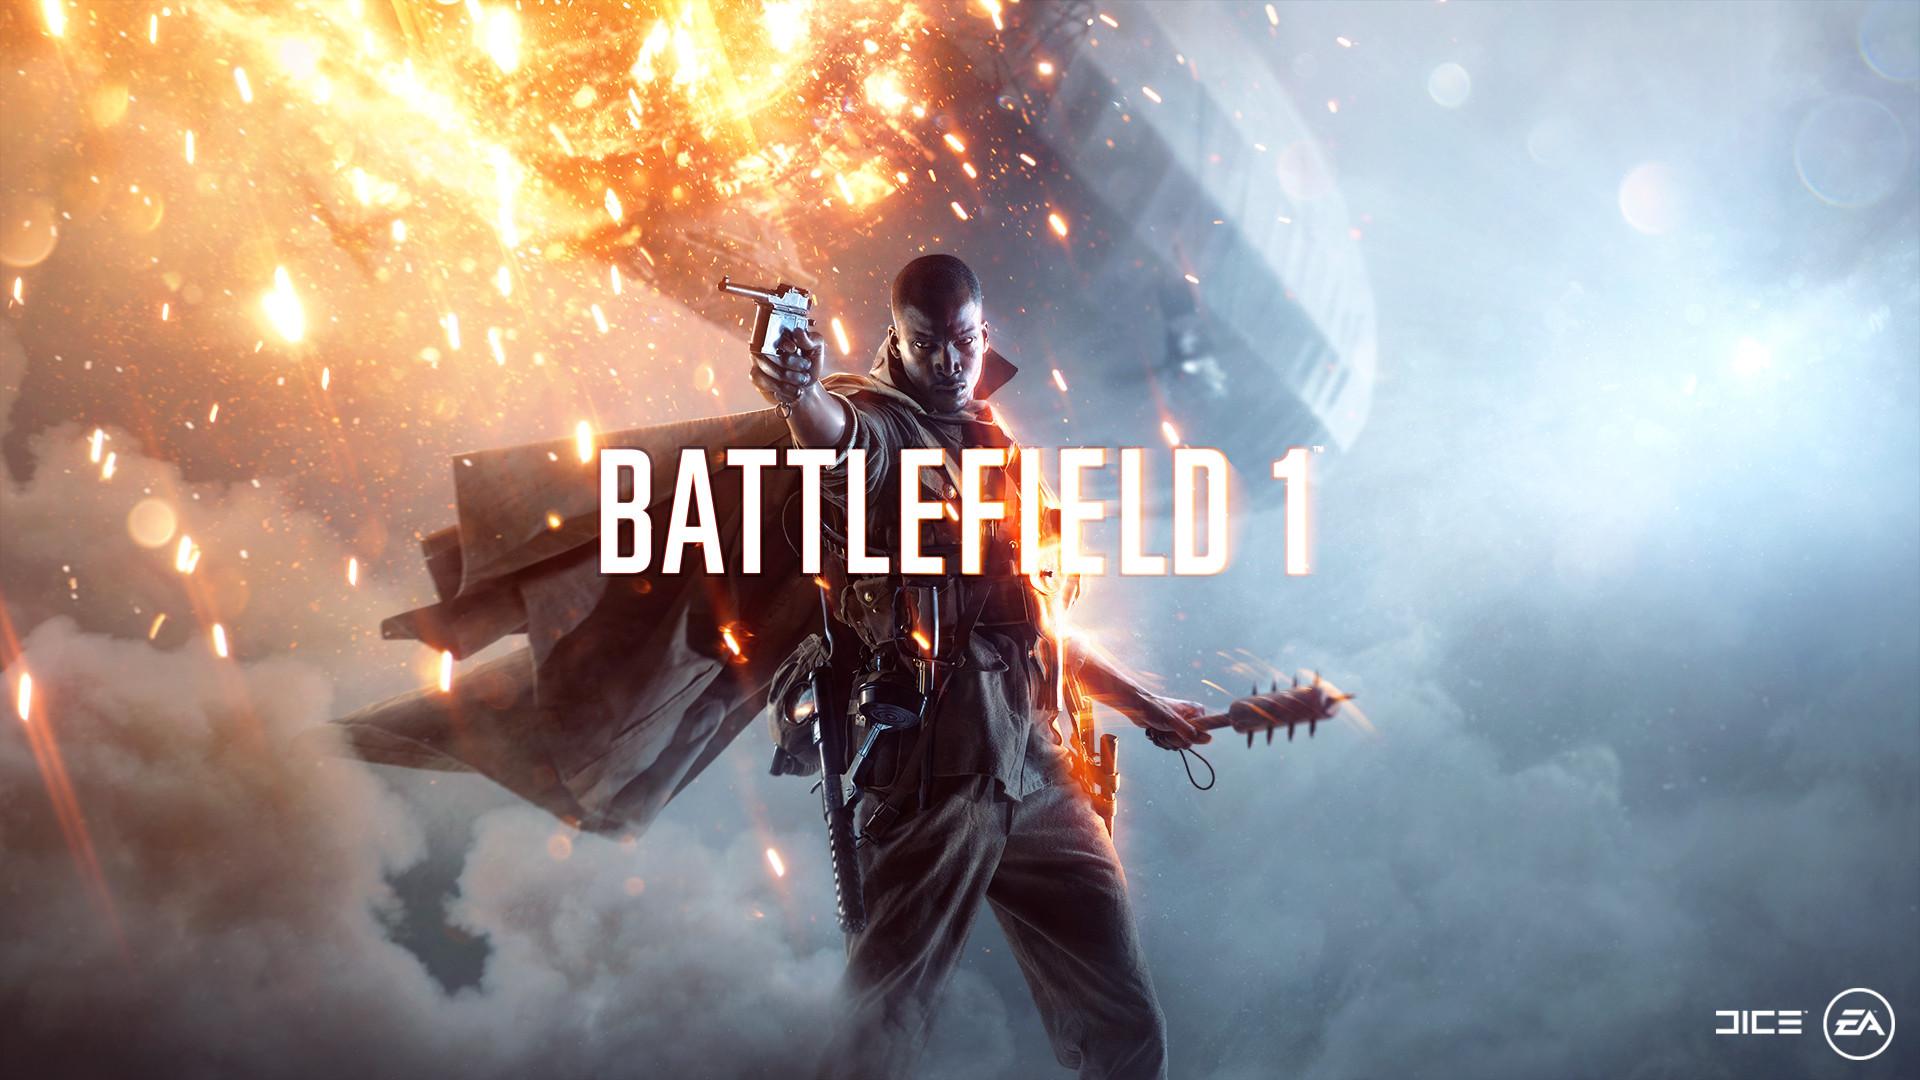 battlefield 1 will have